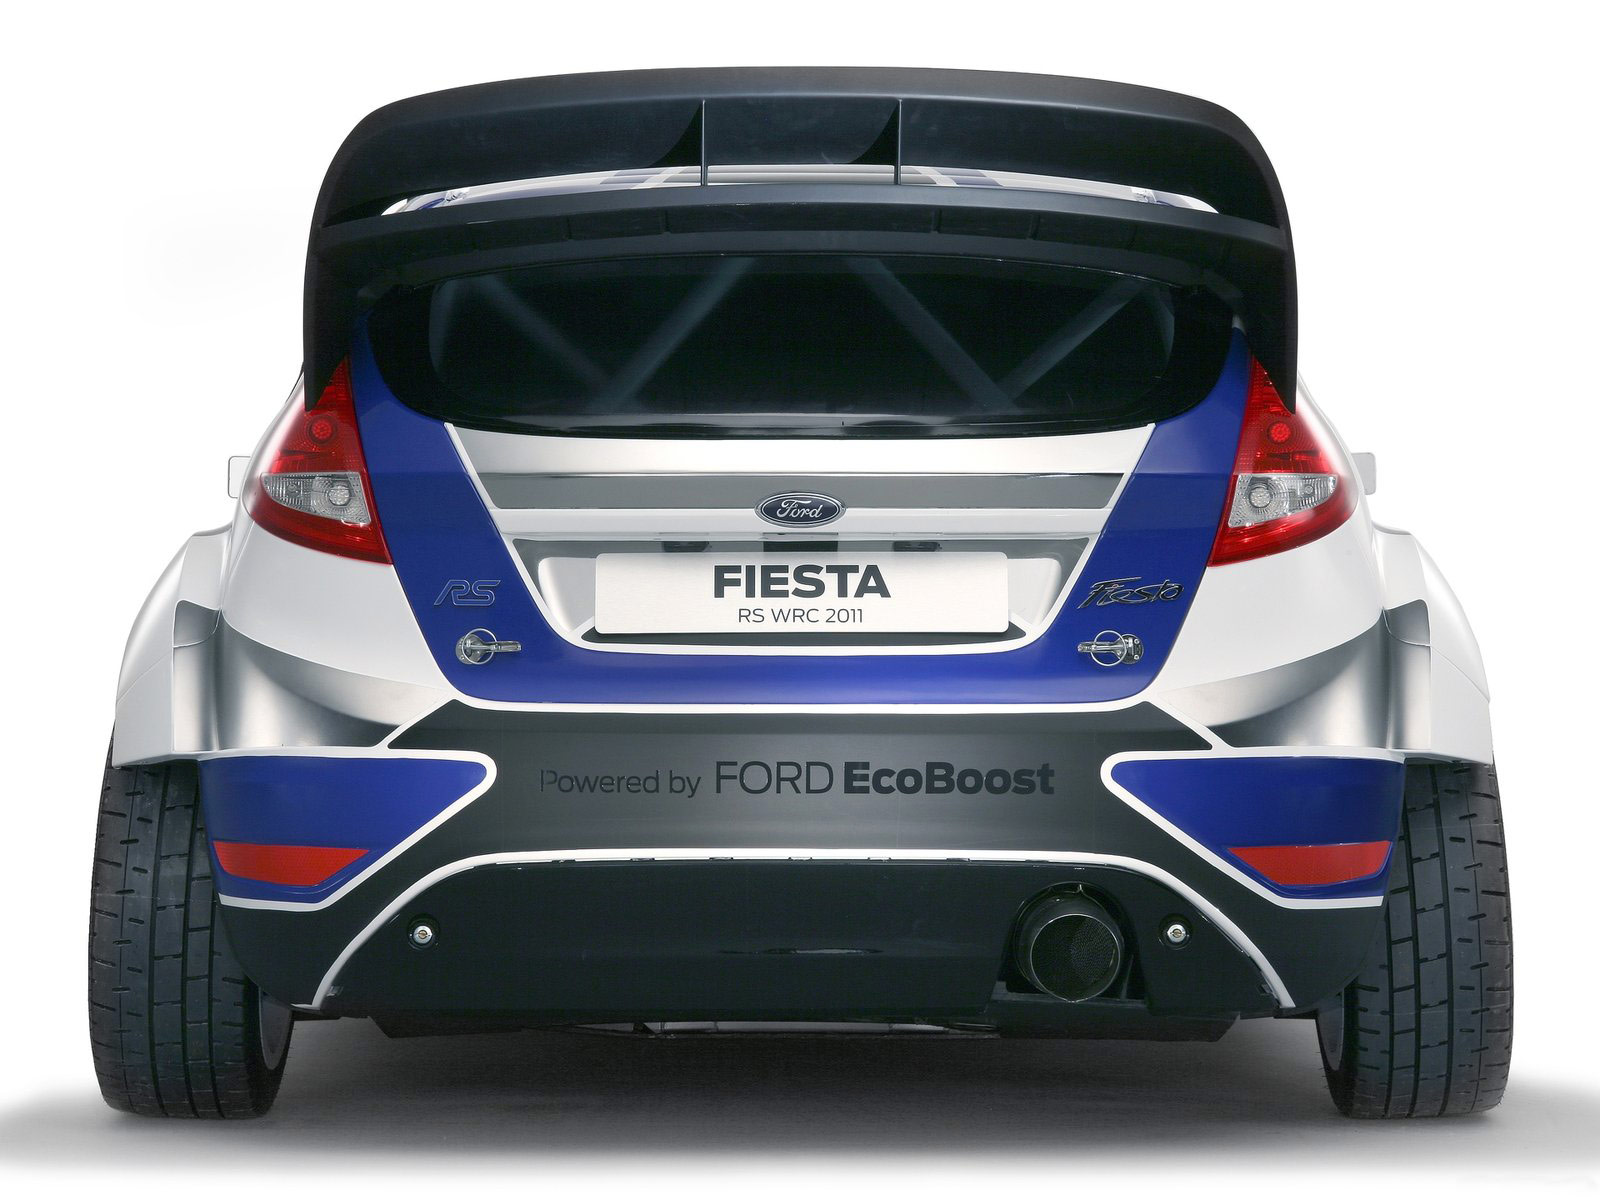 First Team Toyota >> Gambar Mobil FORD Fiesta RS WRC 2011